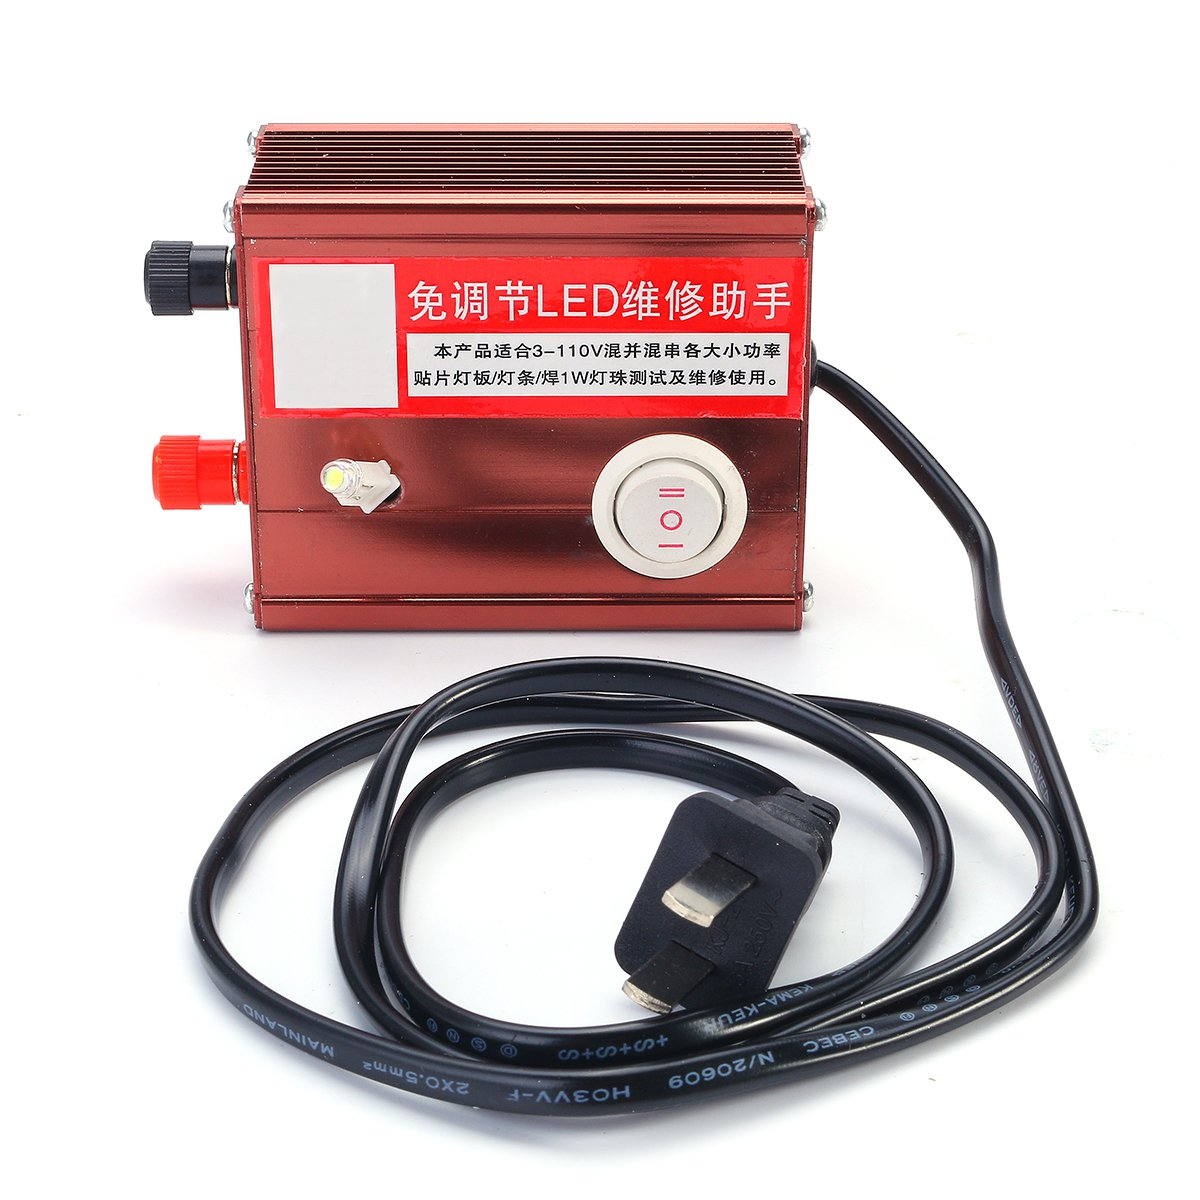 LED Lamp Cover Tester LED Beads Detect Repair Tool LED Strips TV Monitor Laptop Detect  Alexnldcom